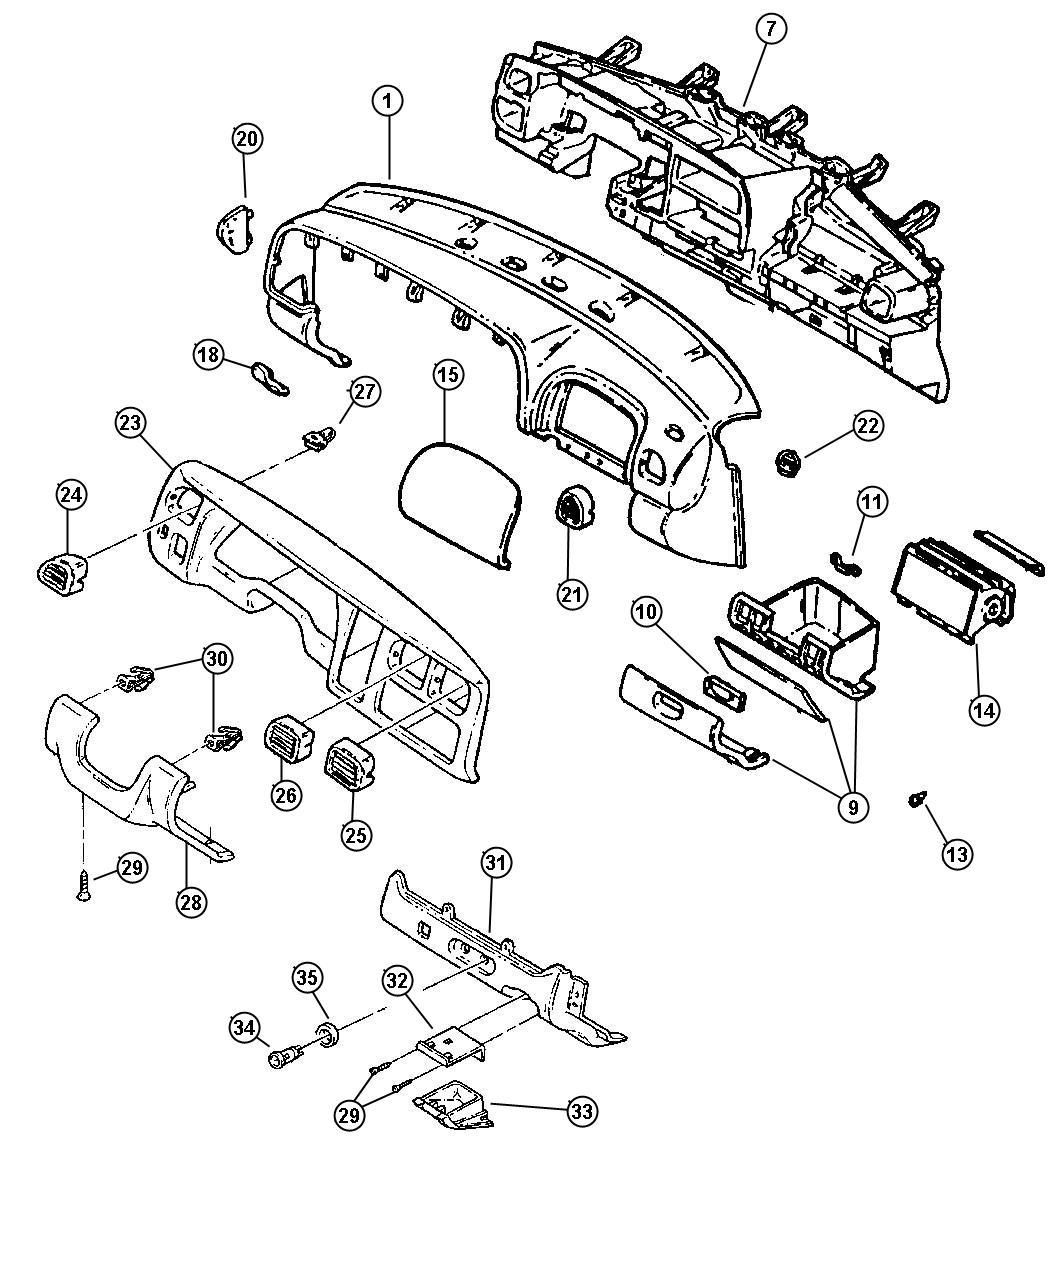 2007 Dodge Caliber Handle. Parking brake. Trim: [all trim